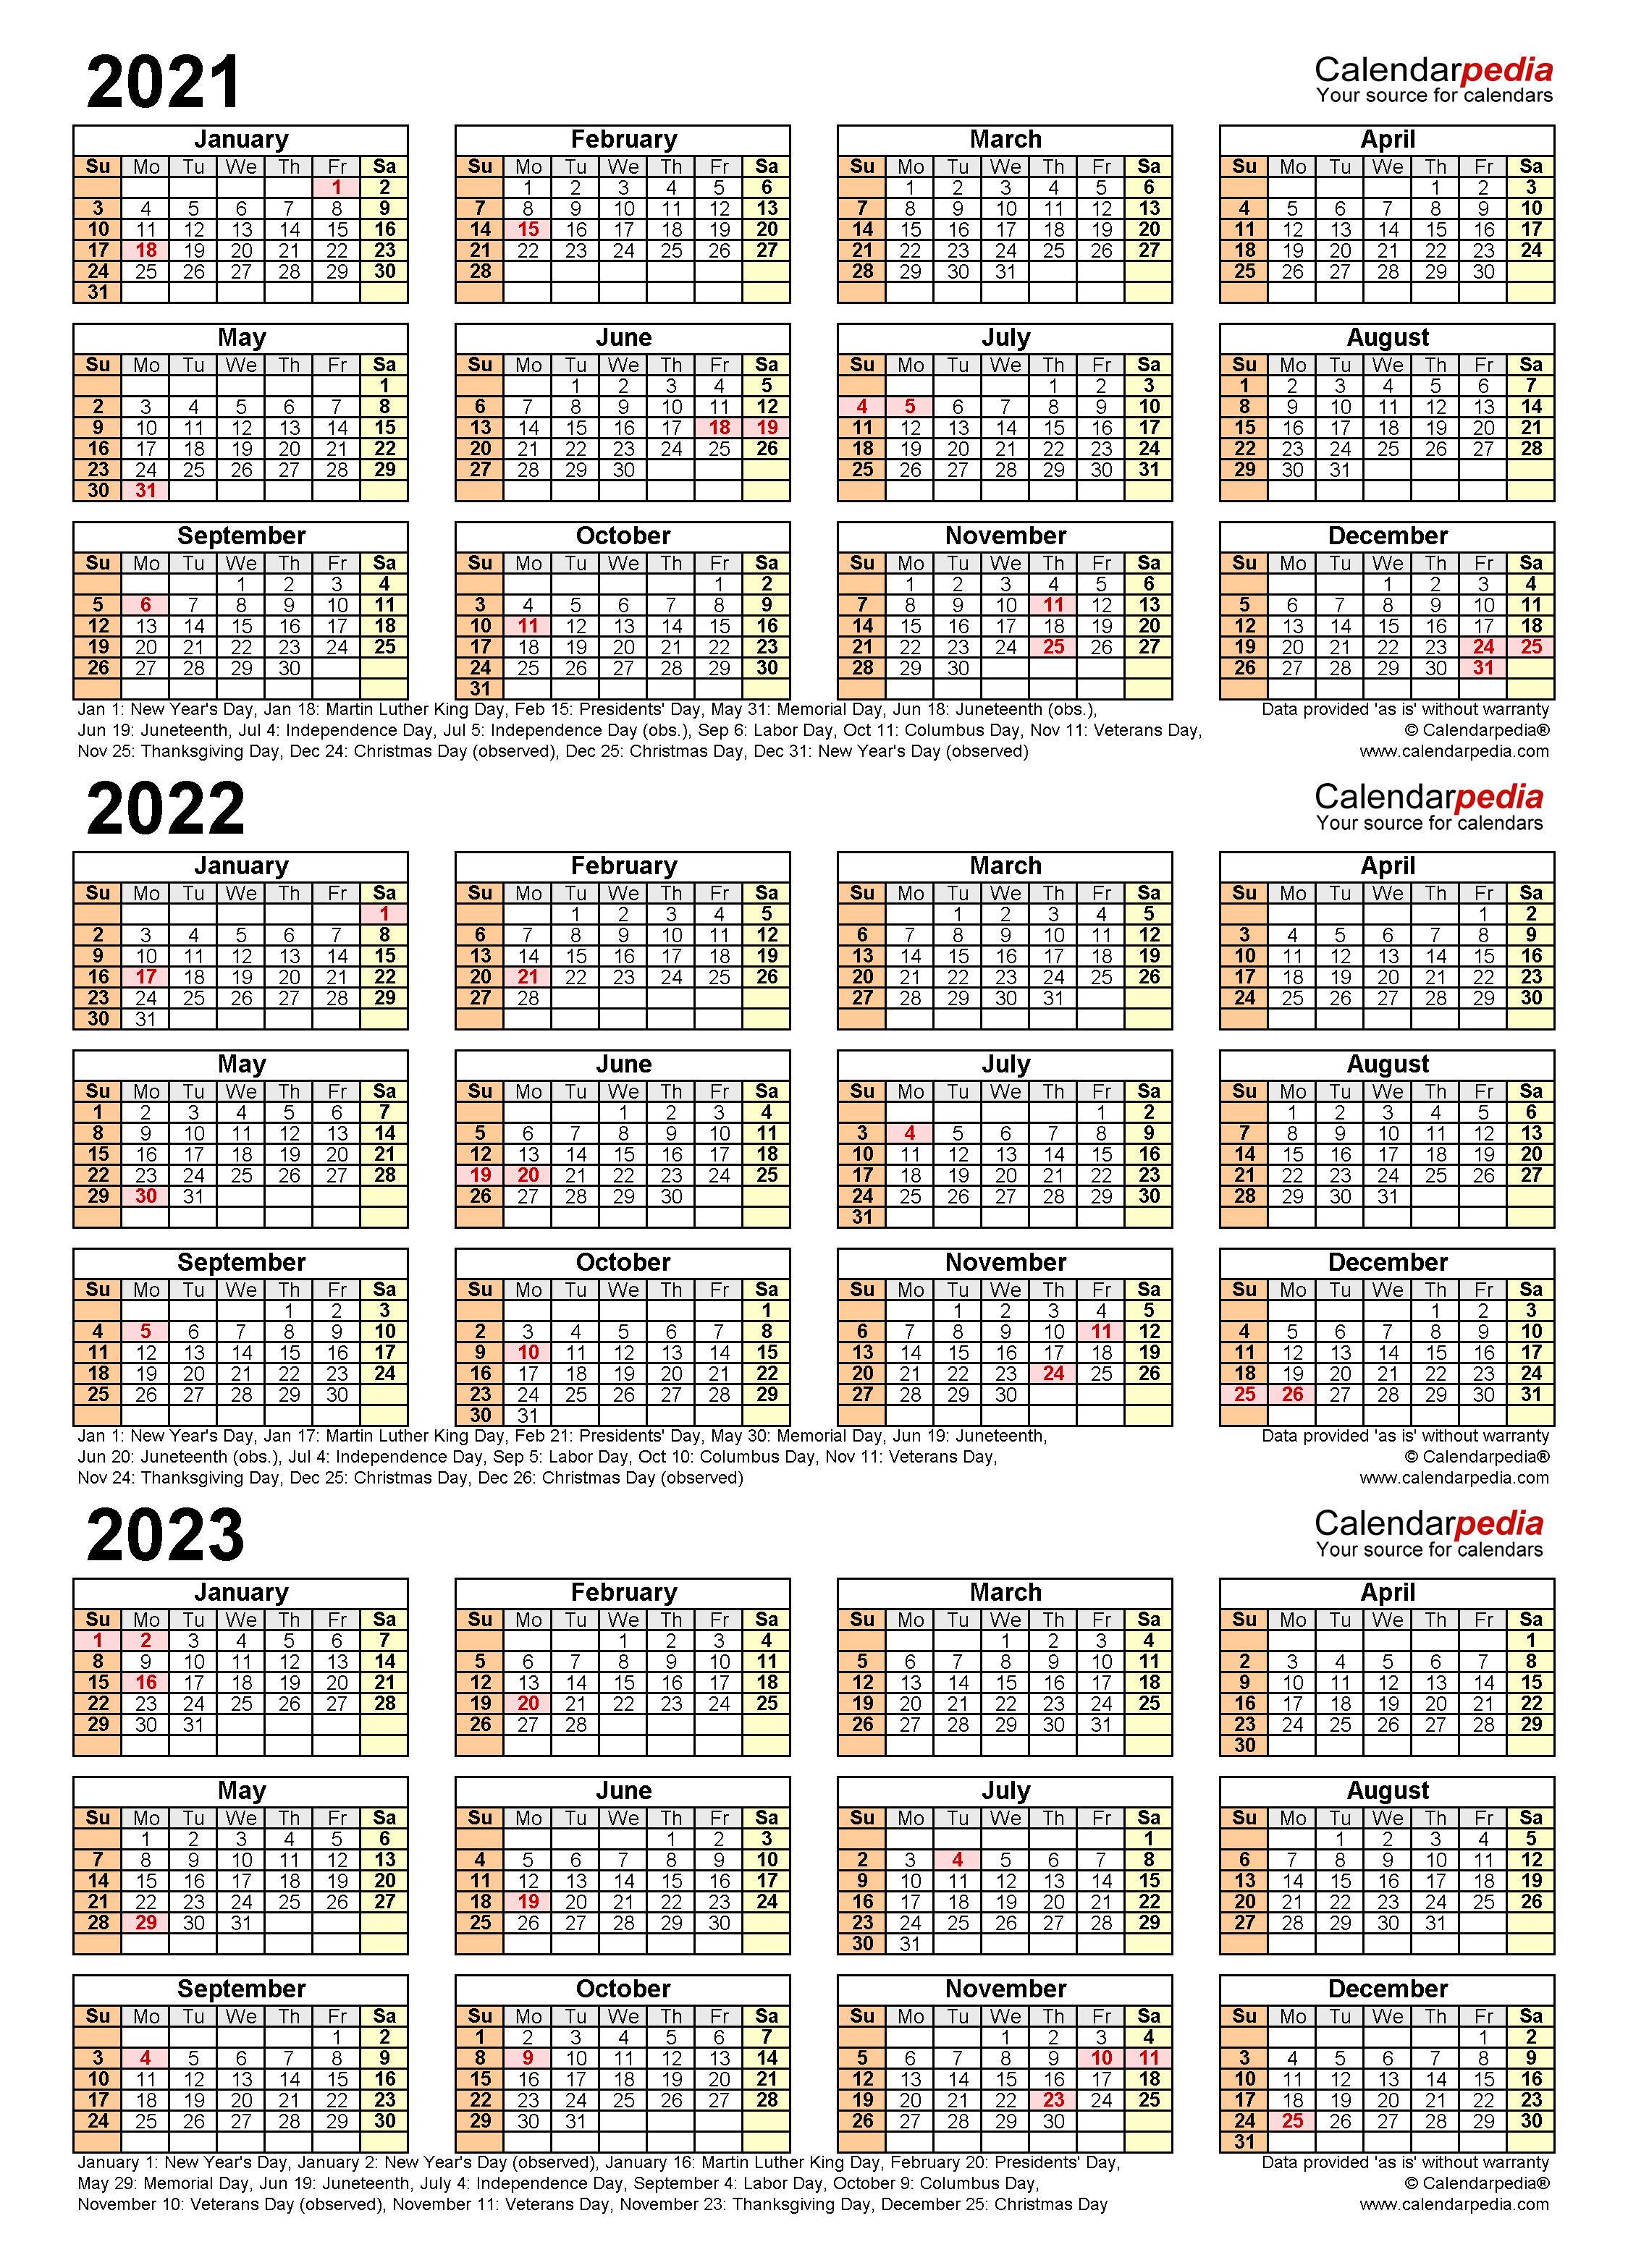 Uf Calendar 2023 To 2022.2021 2023 Three Year Calendar Free Printable Word Templates